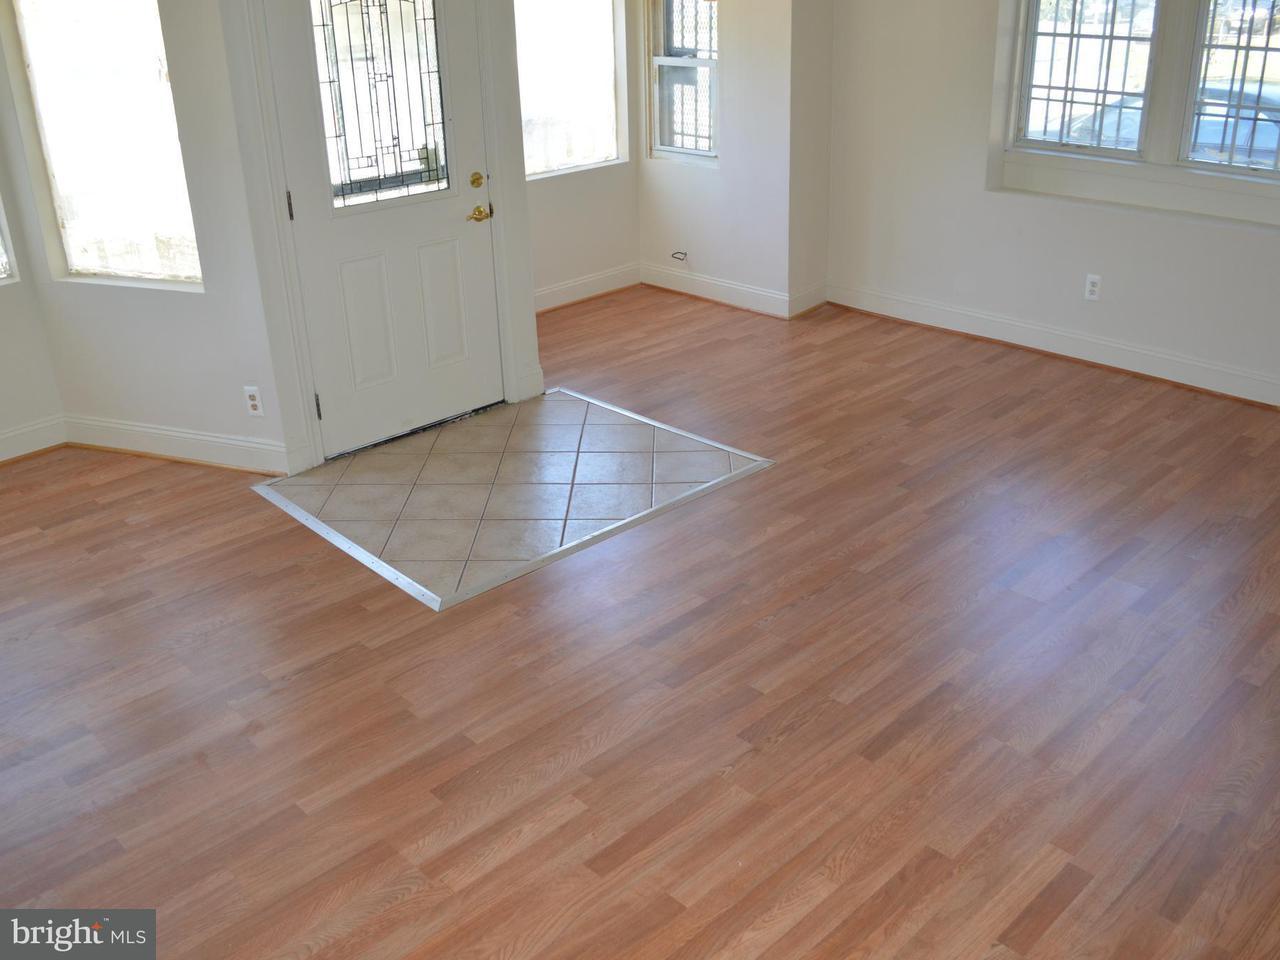 Additional photo for property listing at 1679 MONTELLO AVE NE 1679 MONTELLO AVE NE 华盛顿市, 哥伦比亚特区 20002 美国